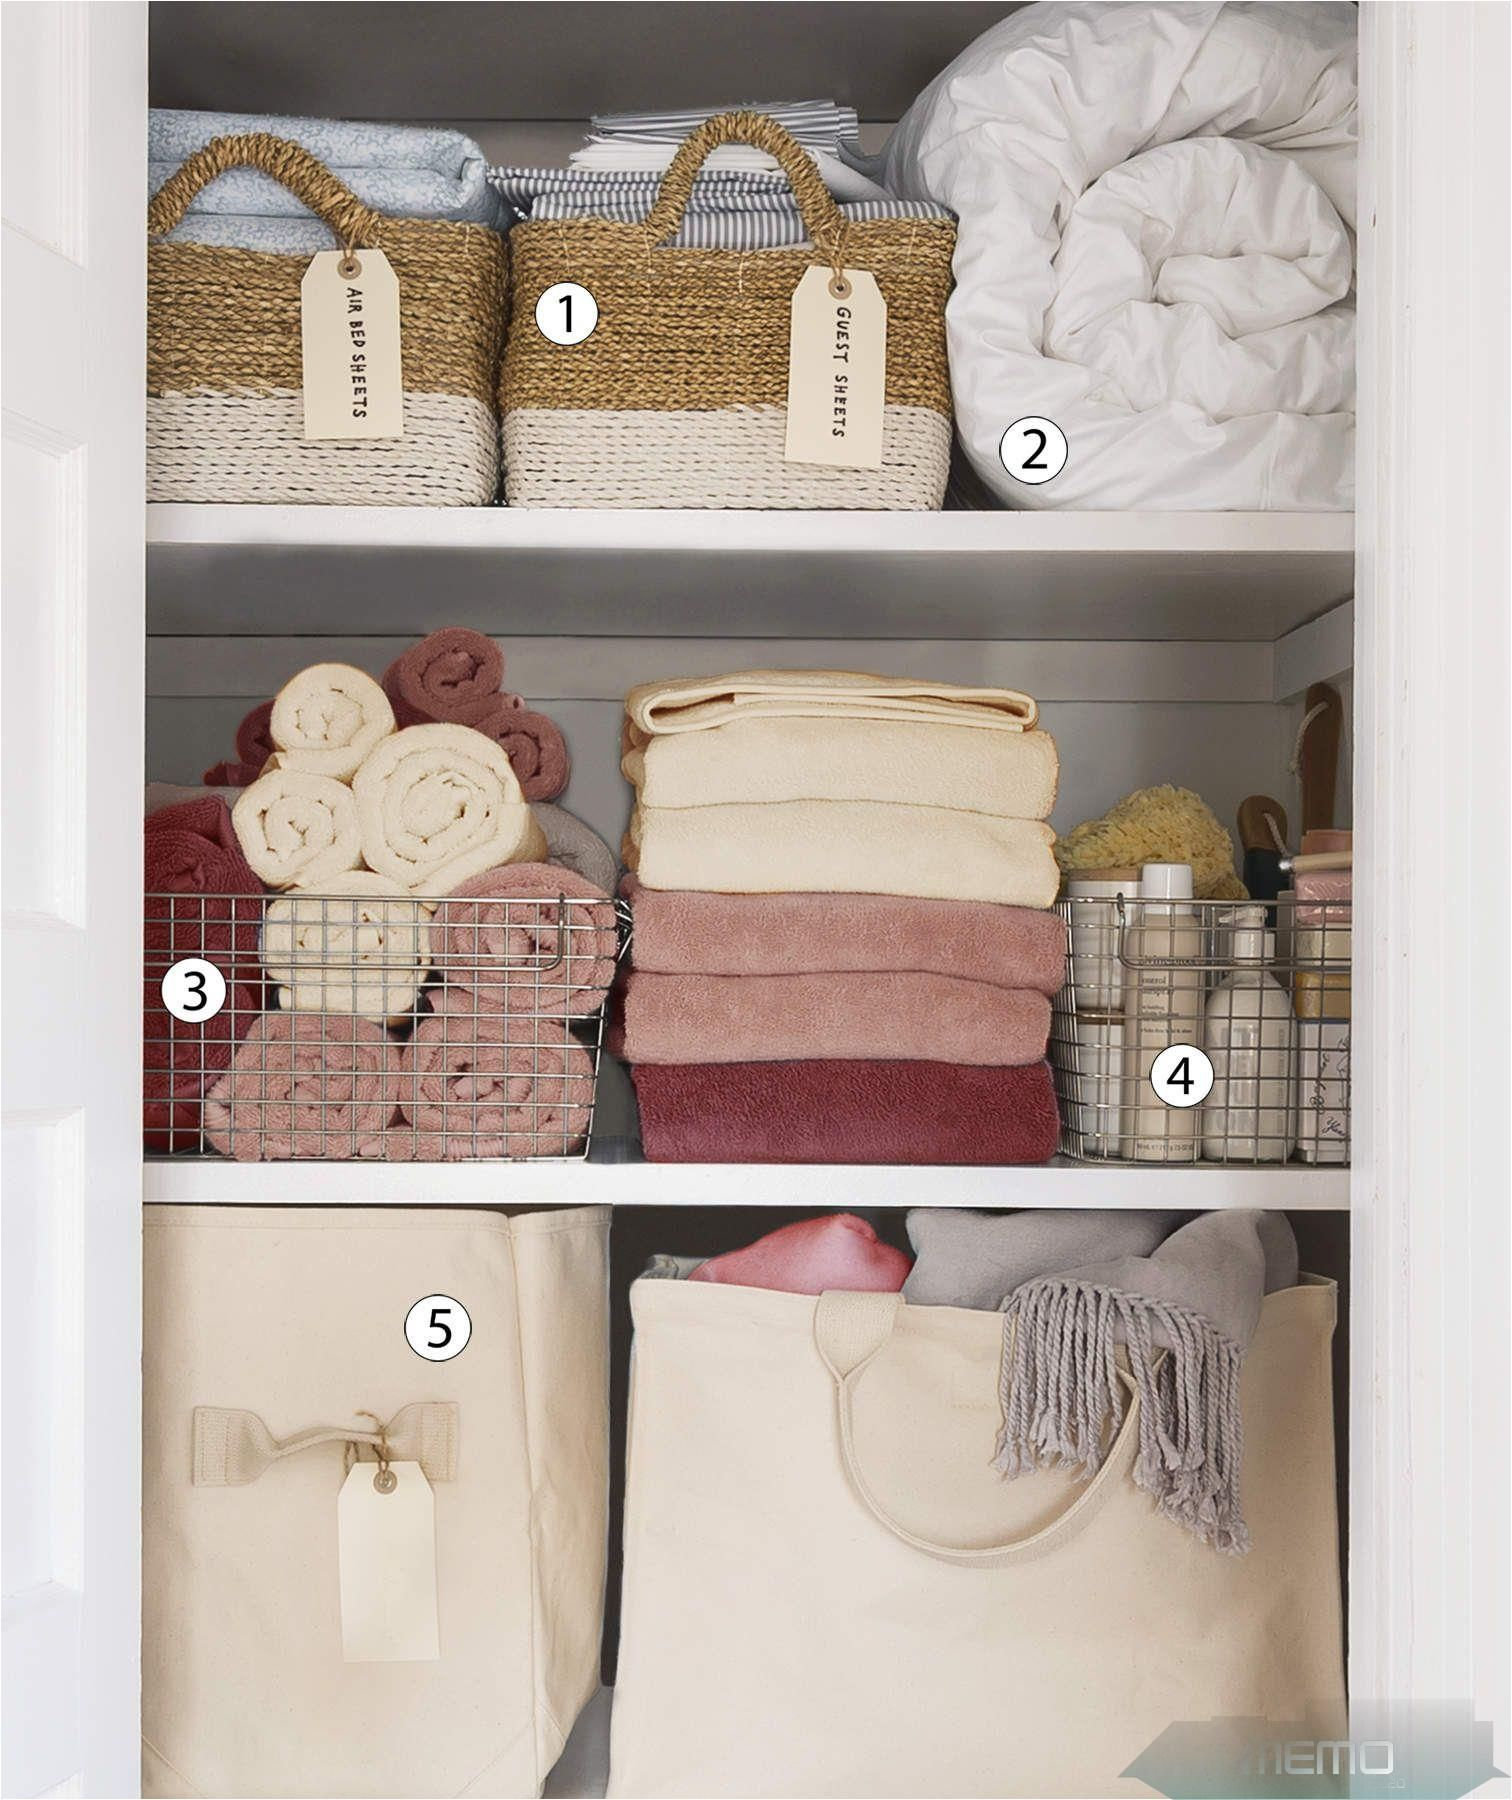 Jul 21 2017 Few Things Are As Satisfying As A Neat Linen Closet Right Pro Organ In 2020 Wascheschrank Organisation Kleiderschrankordnung Selbstgemachter Schrank